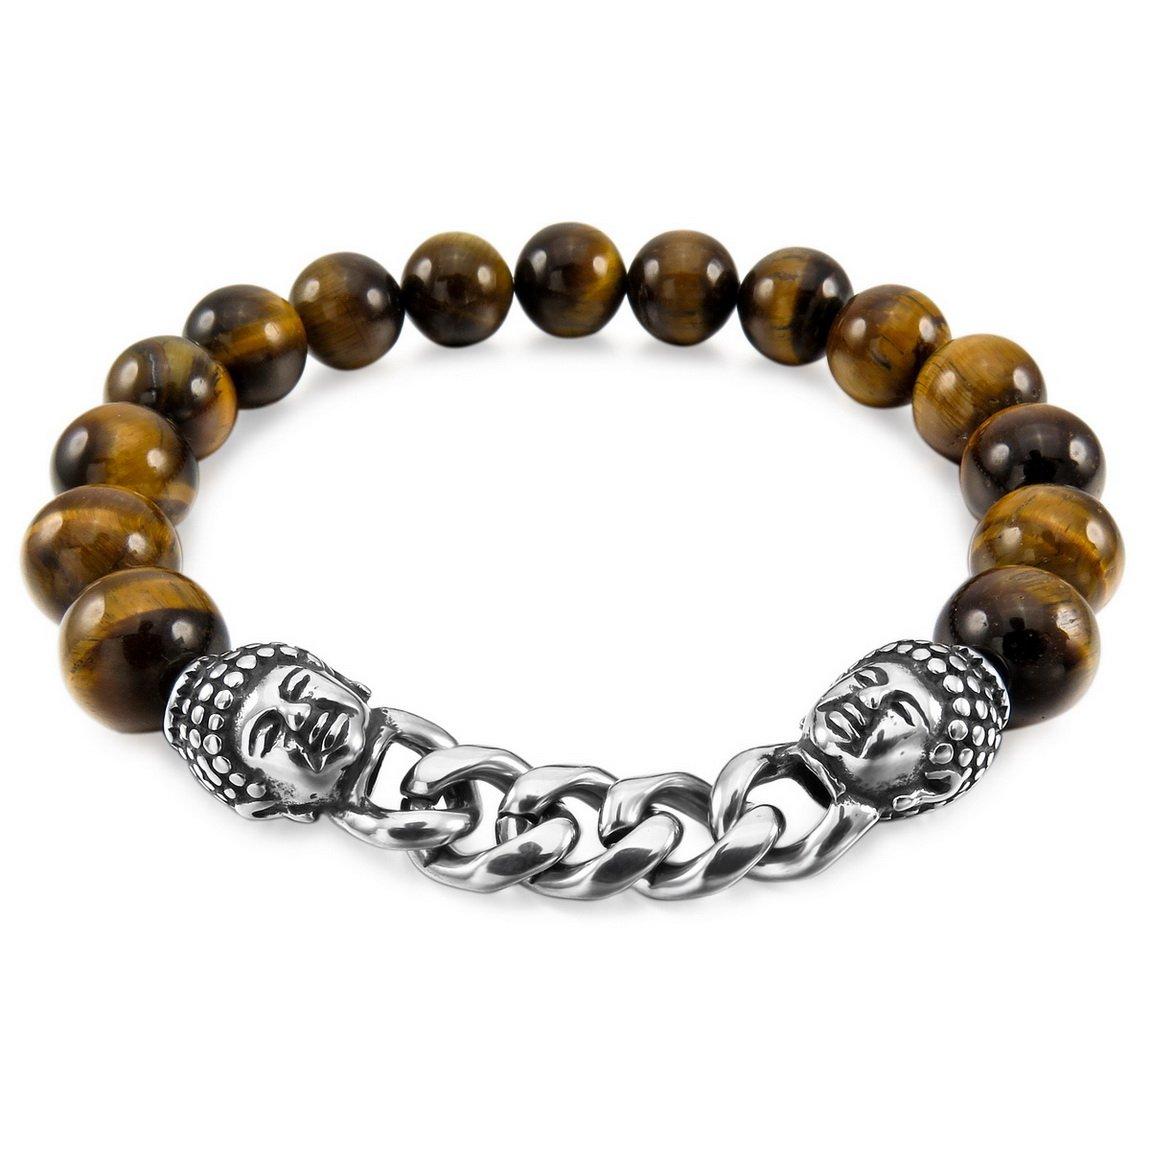 INBLUE Men,Women's 10mm Stainless Steel Energy Bracelet Link Wrist Simulated Stone Brown Buddha Mala Bead Elastic